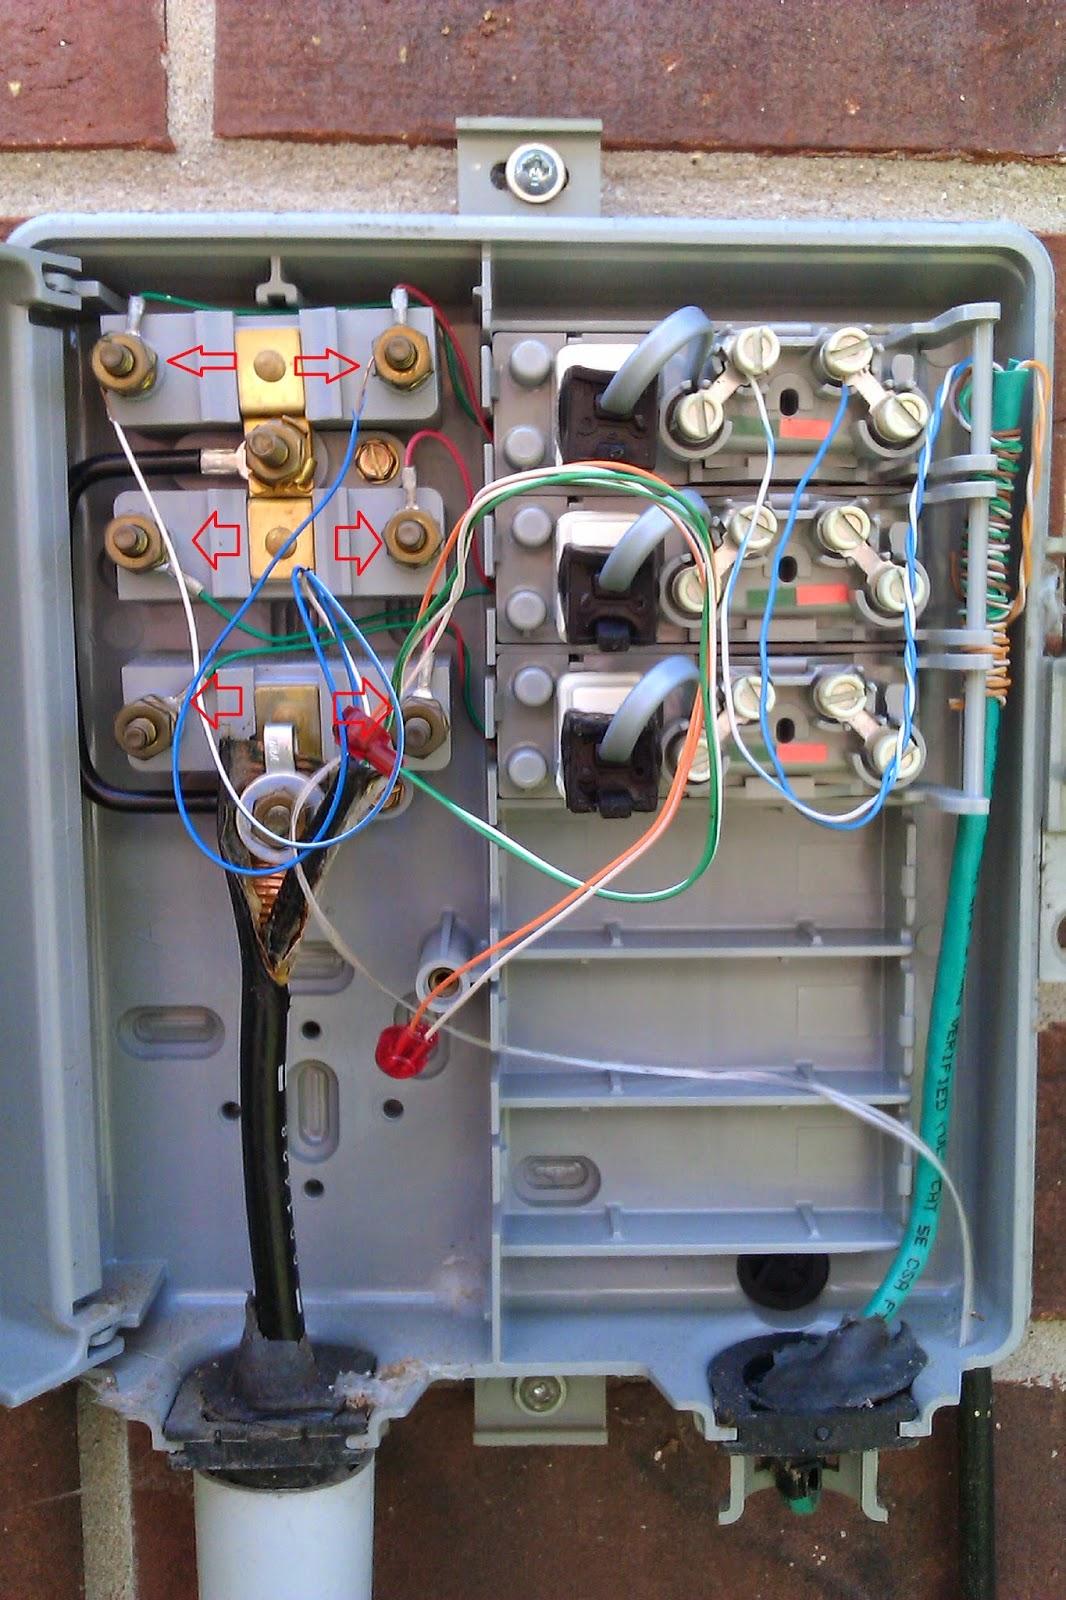 qwest nid wiring guide wiring diagram forward demarcation box outside phone box wiring also phone nid [ 1066 x 1600 Pixel ]